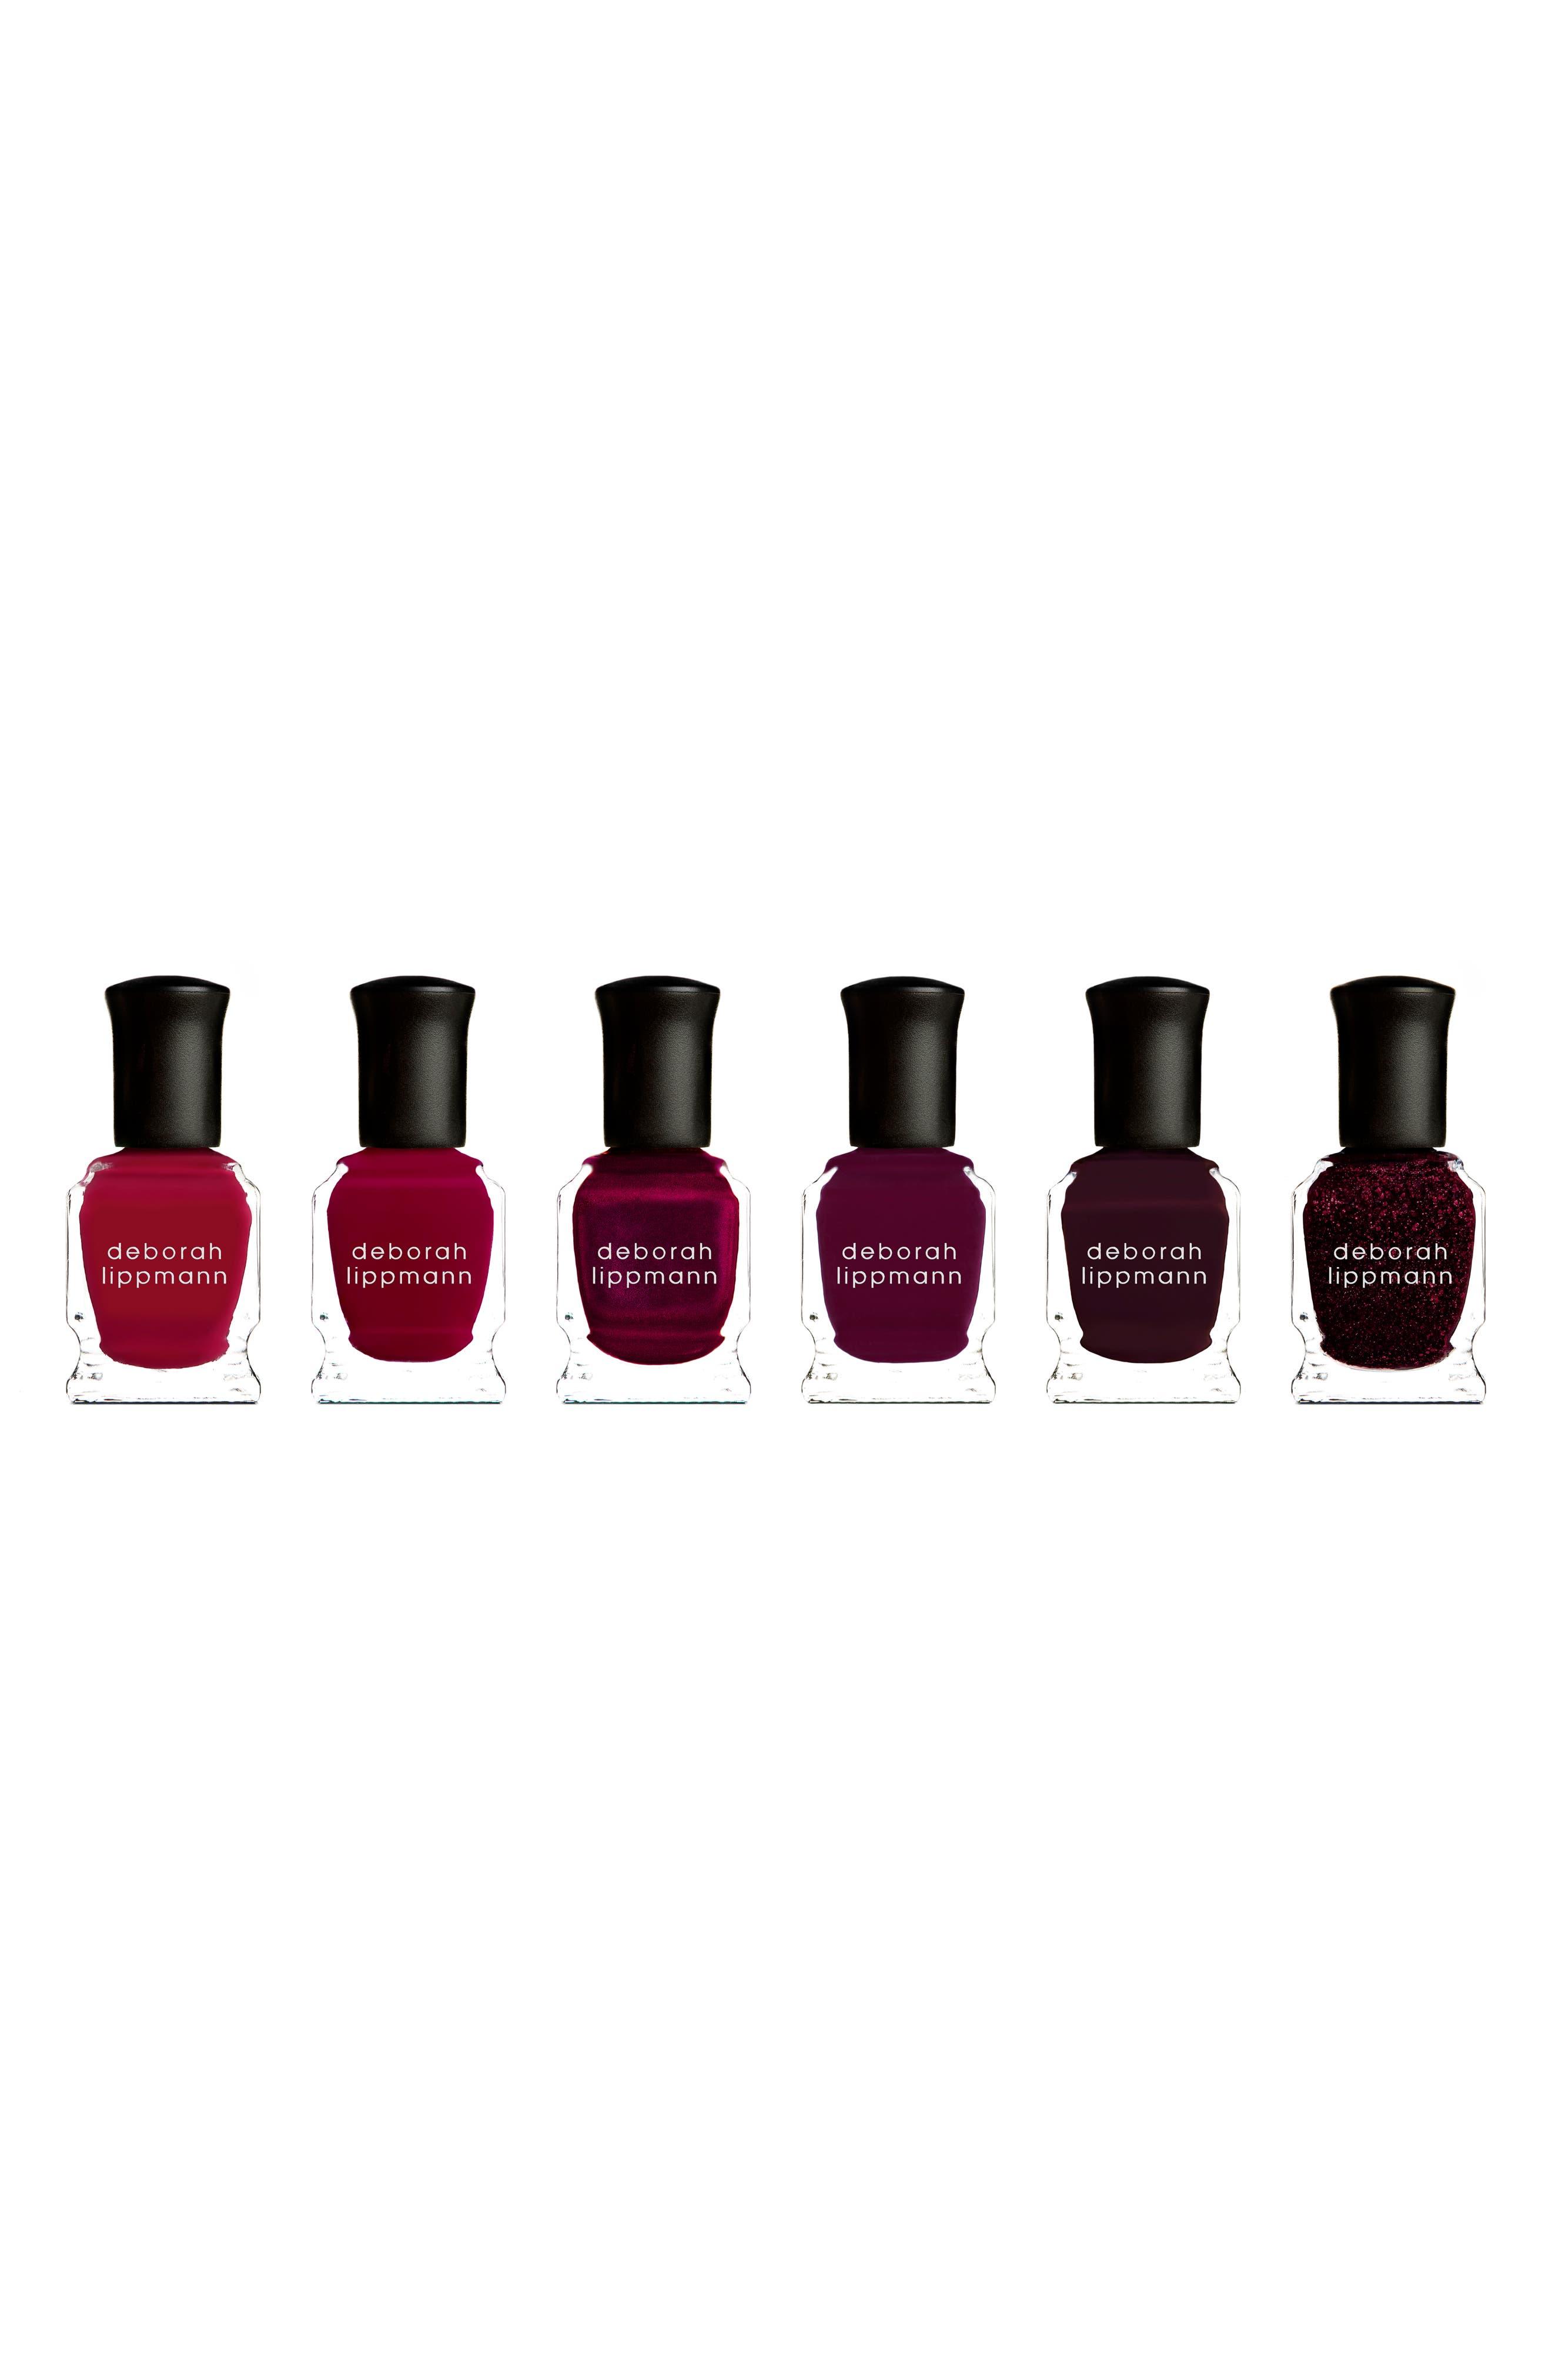 Deborah Lippman Lady in Red Nail Color (Nordstrom Exclusive) ($72 Value)